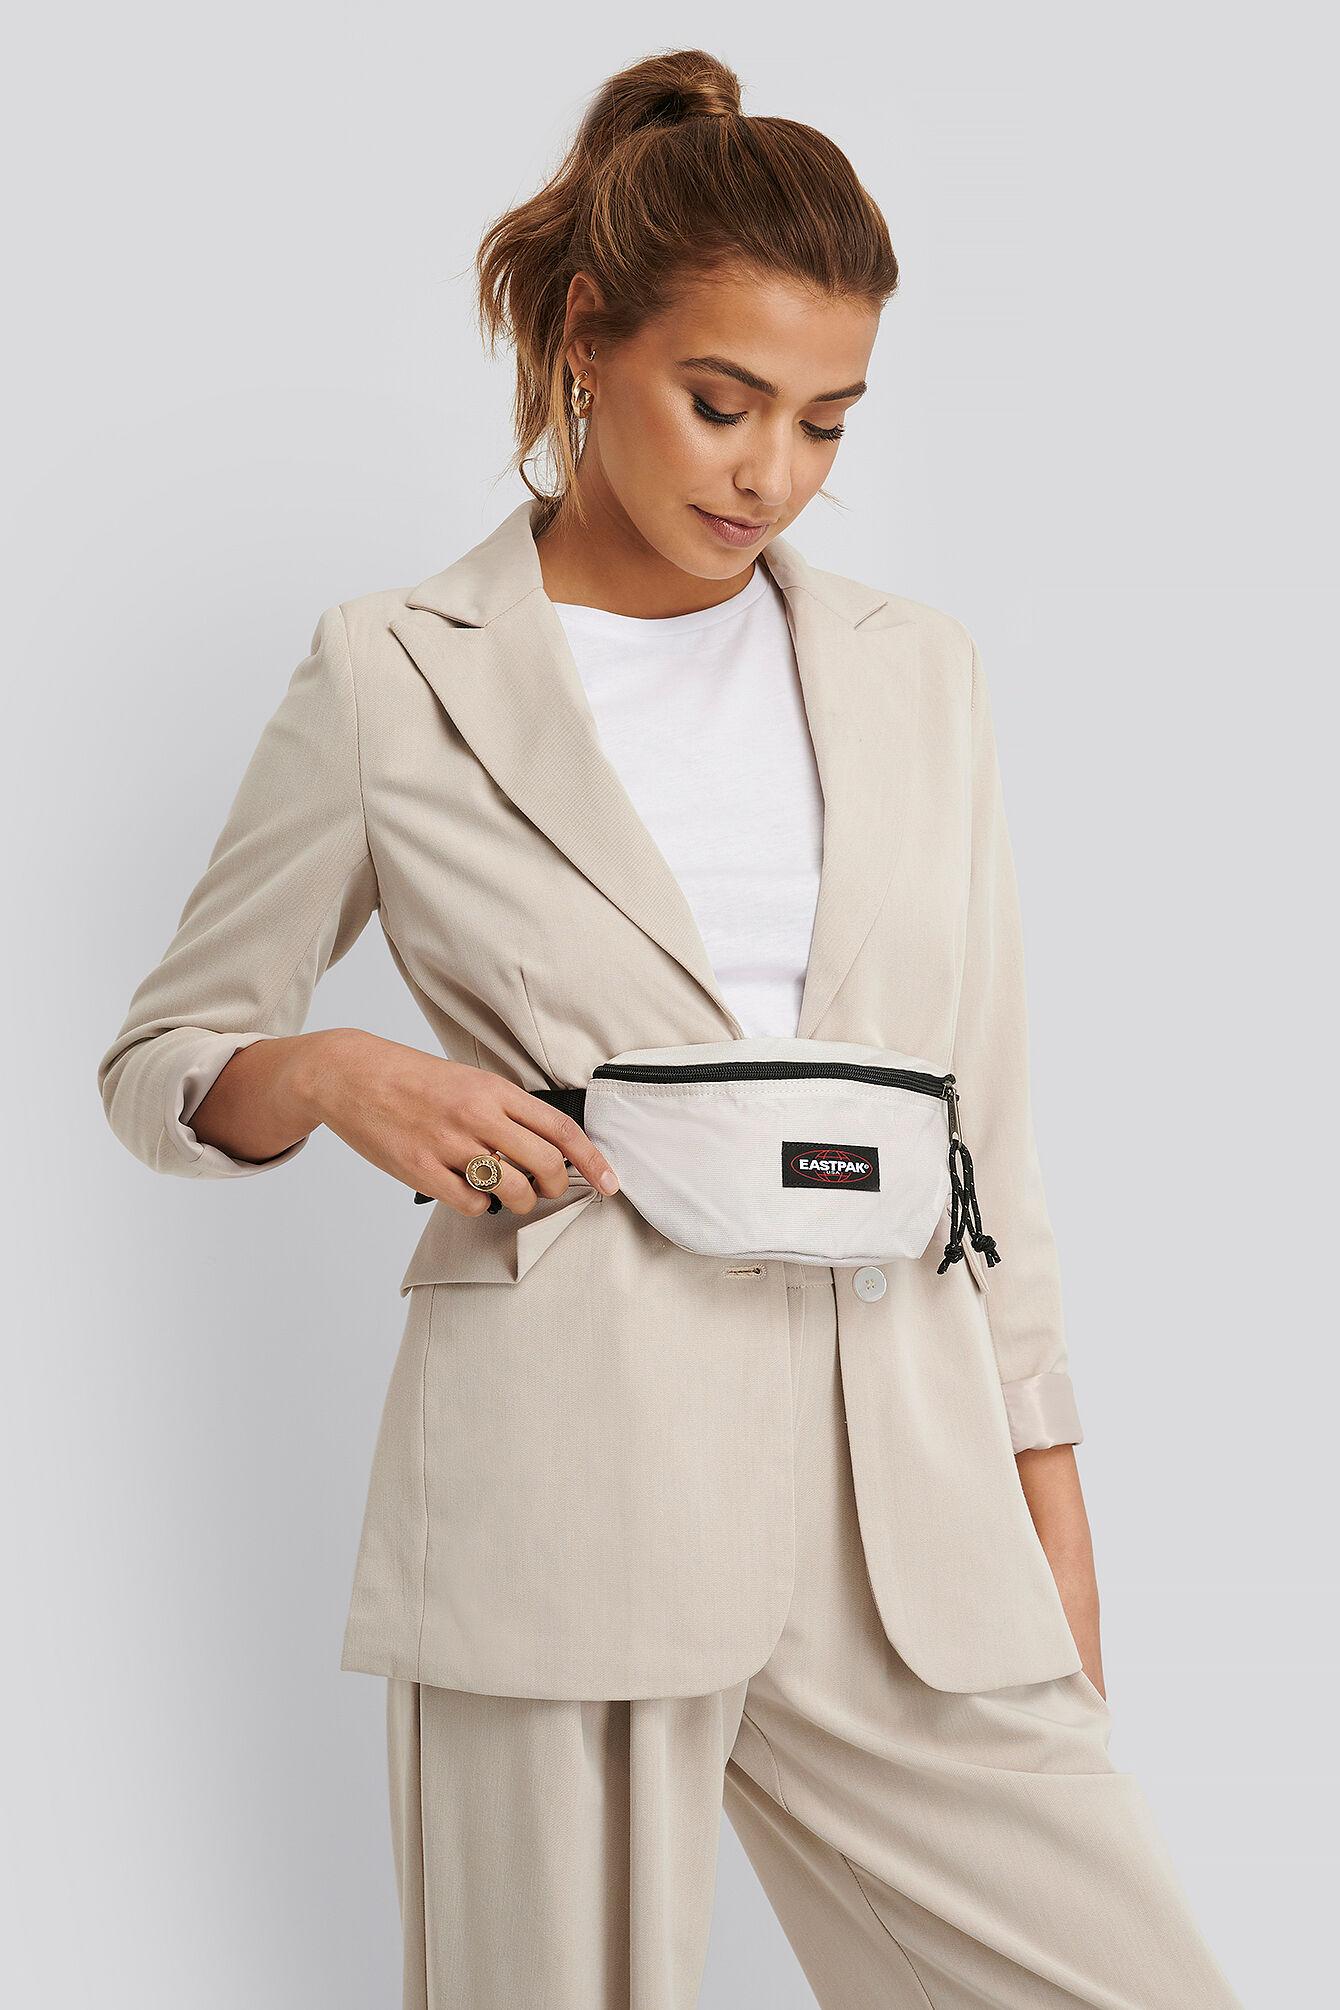 Eastpak Springer Bag - White  - Size: One Size